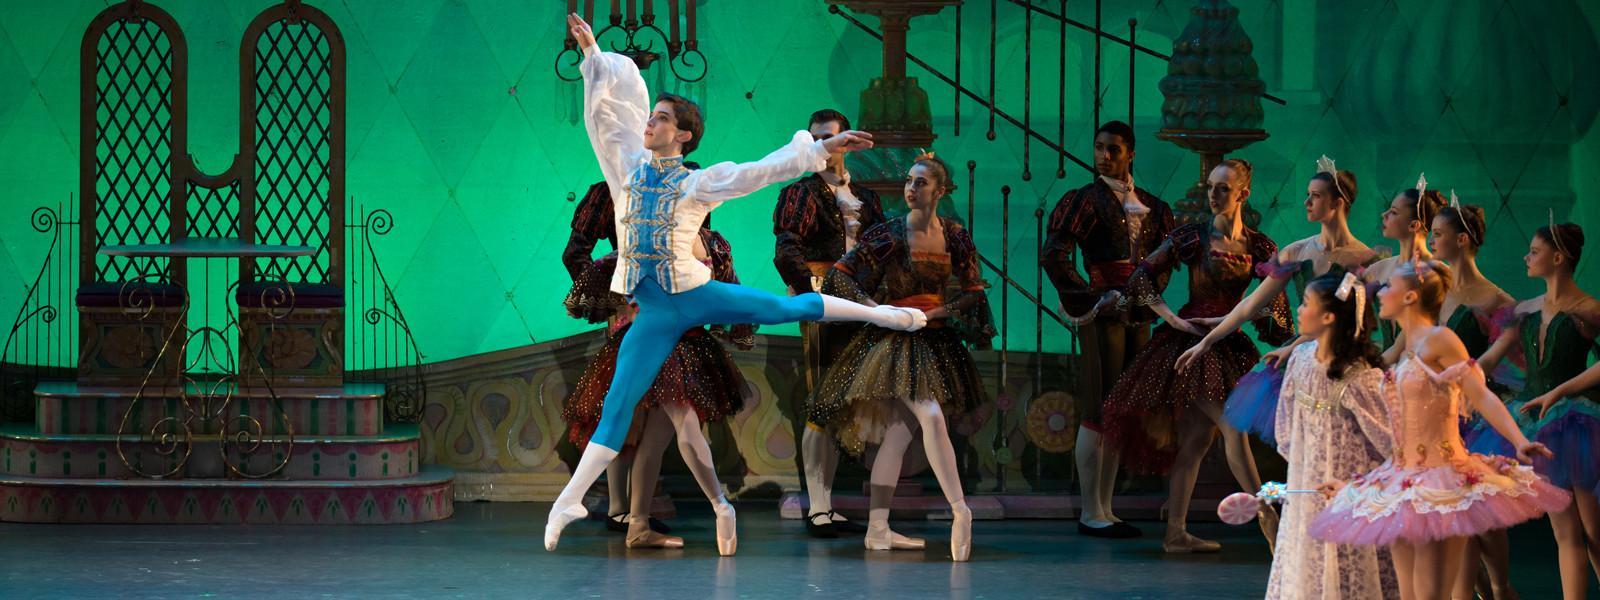 Prince dancing